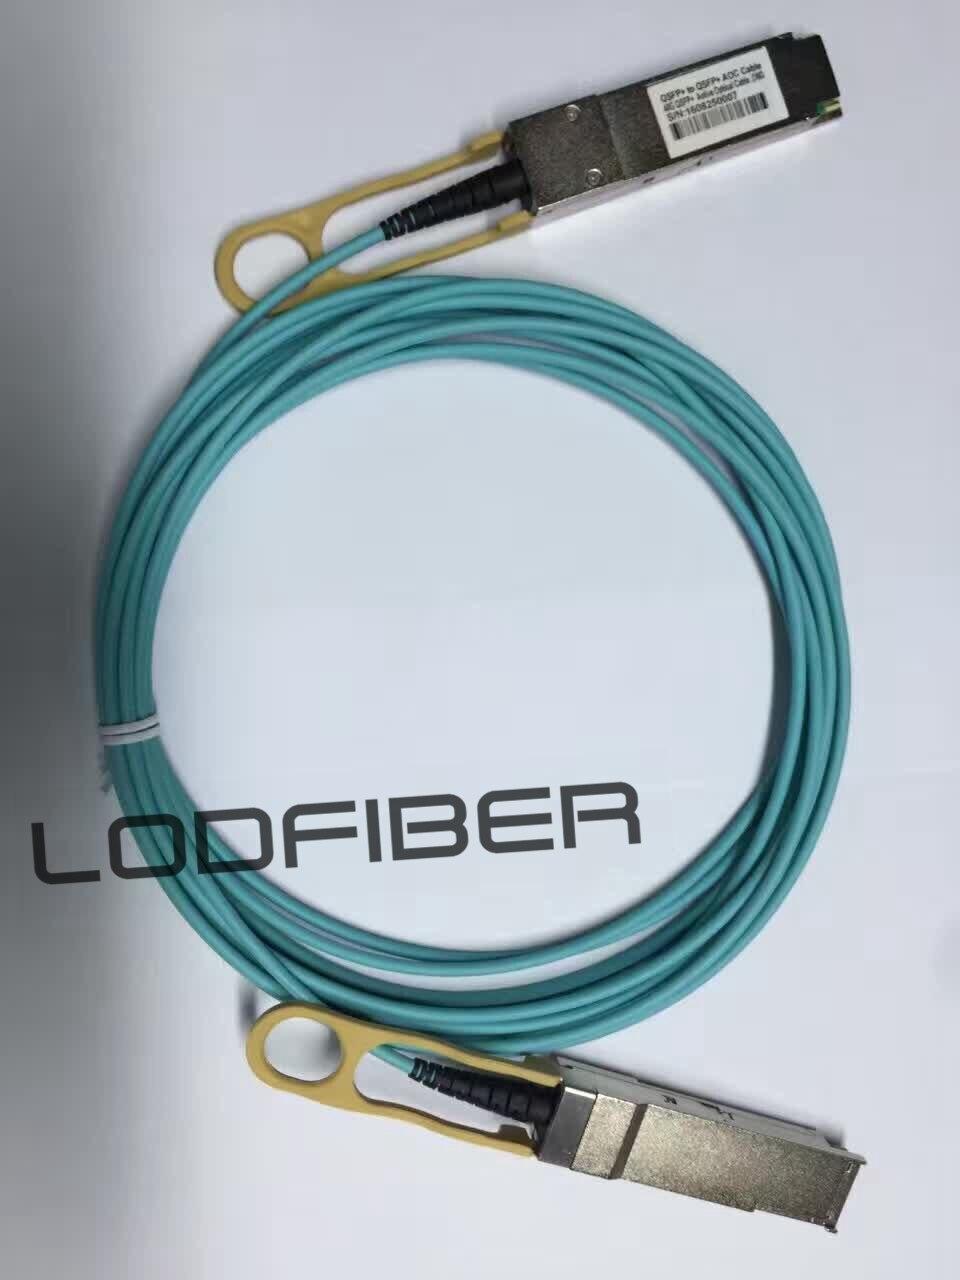 100m (328ft) Mellanox MC2210310-100 Compatible 40G QSFP+ Active Optical Cable100m (328ft) Mellanox MC2210310-100 Compatible 40G QSFP+ Active Optical Cable